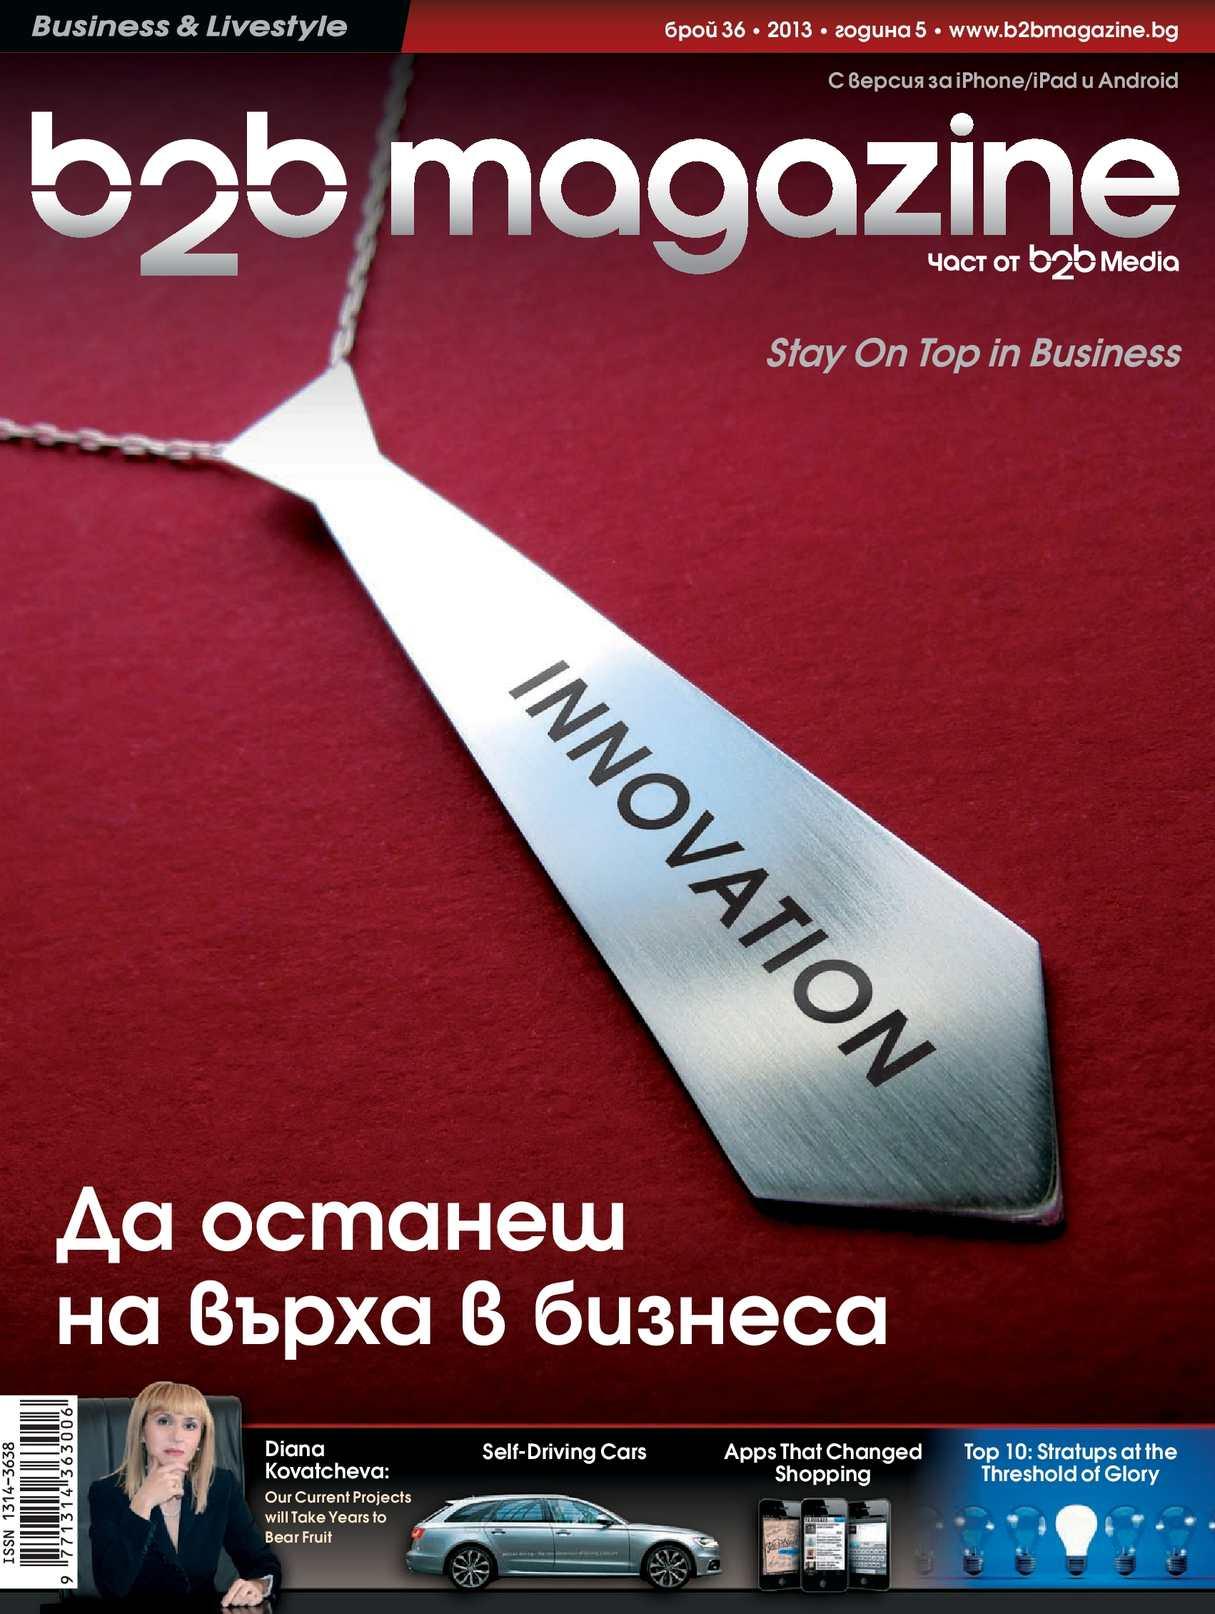 9c889e28f53 Calaméo - Списание B2B Magazine - брой 36 / 2013